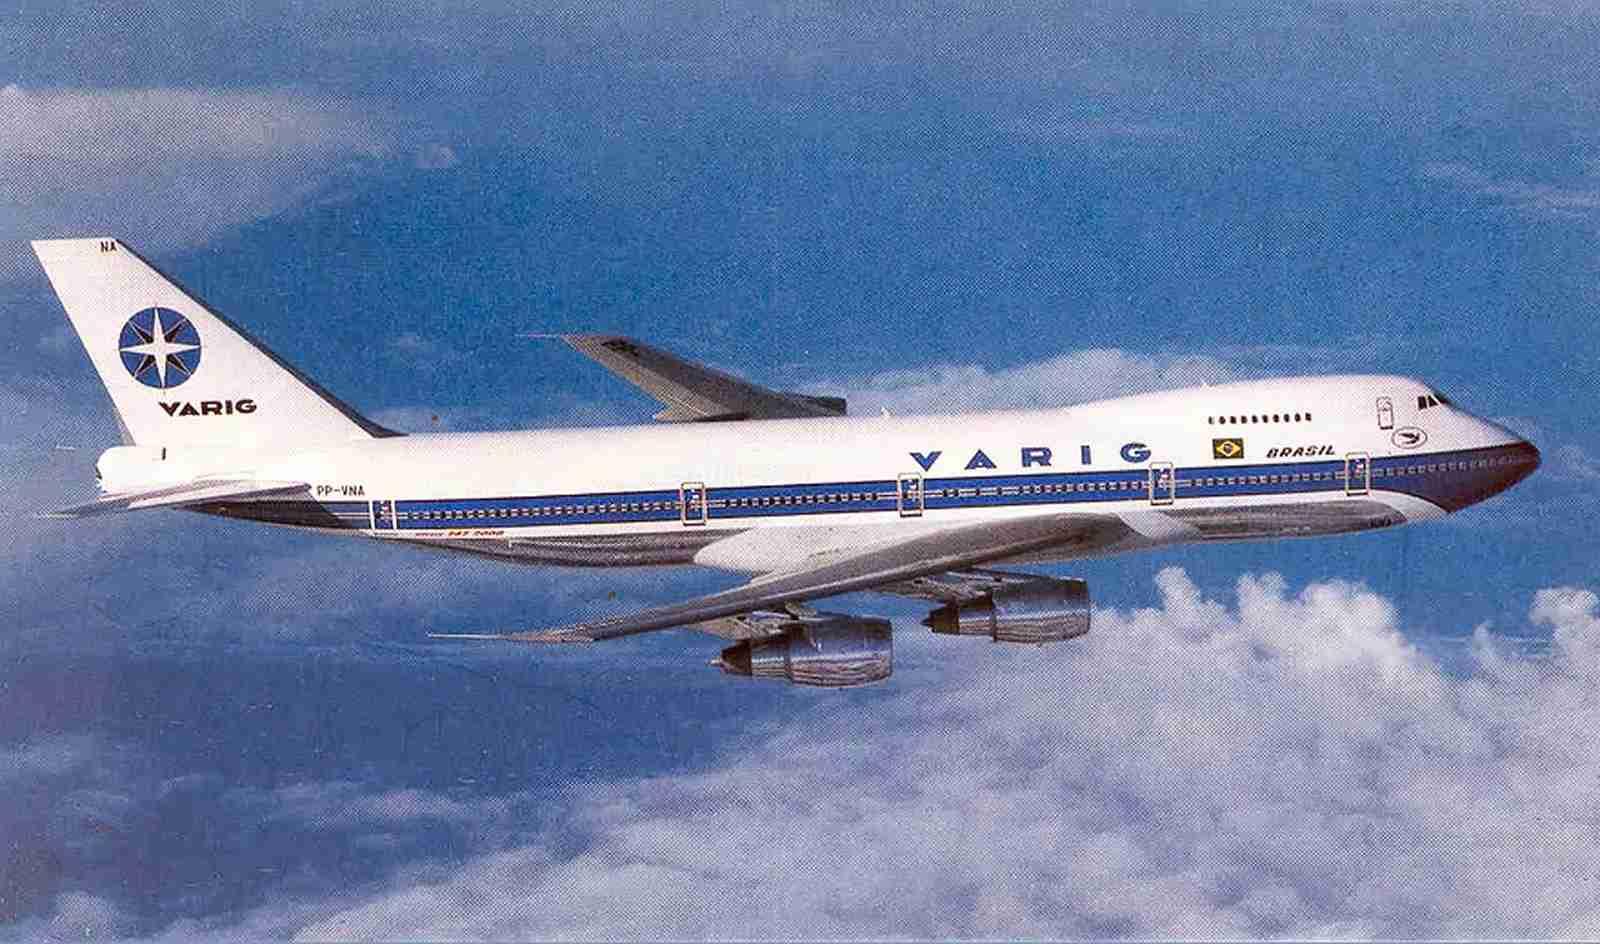 Varig's stylish, 80s-era uniform seen on a 747-200.